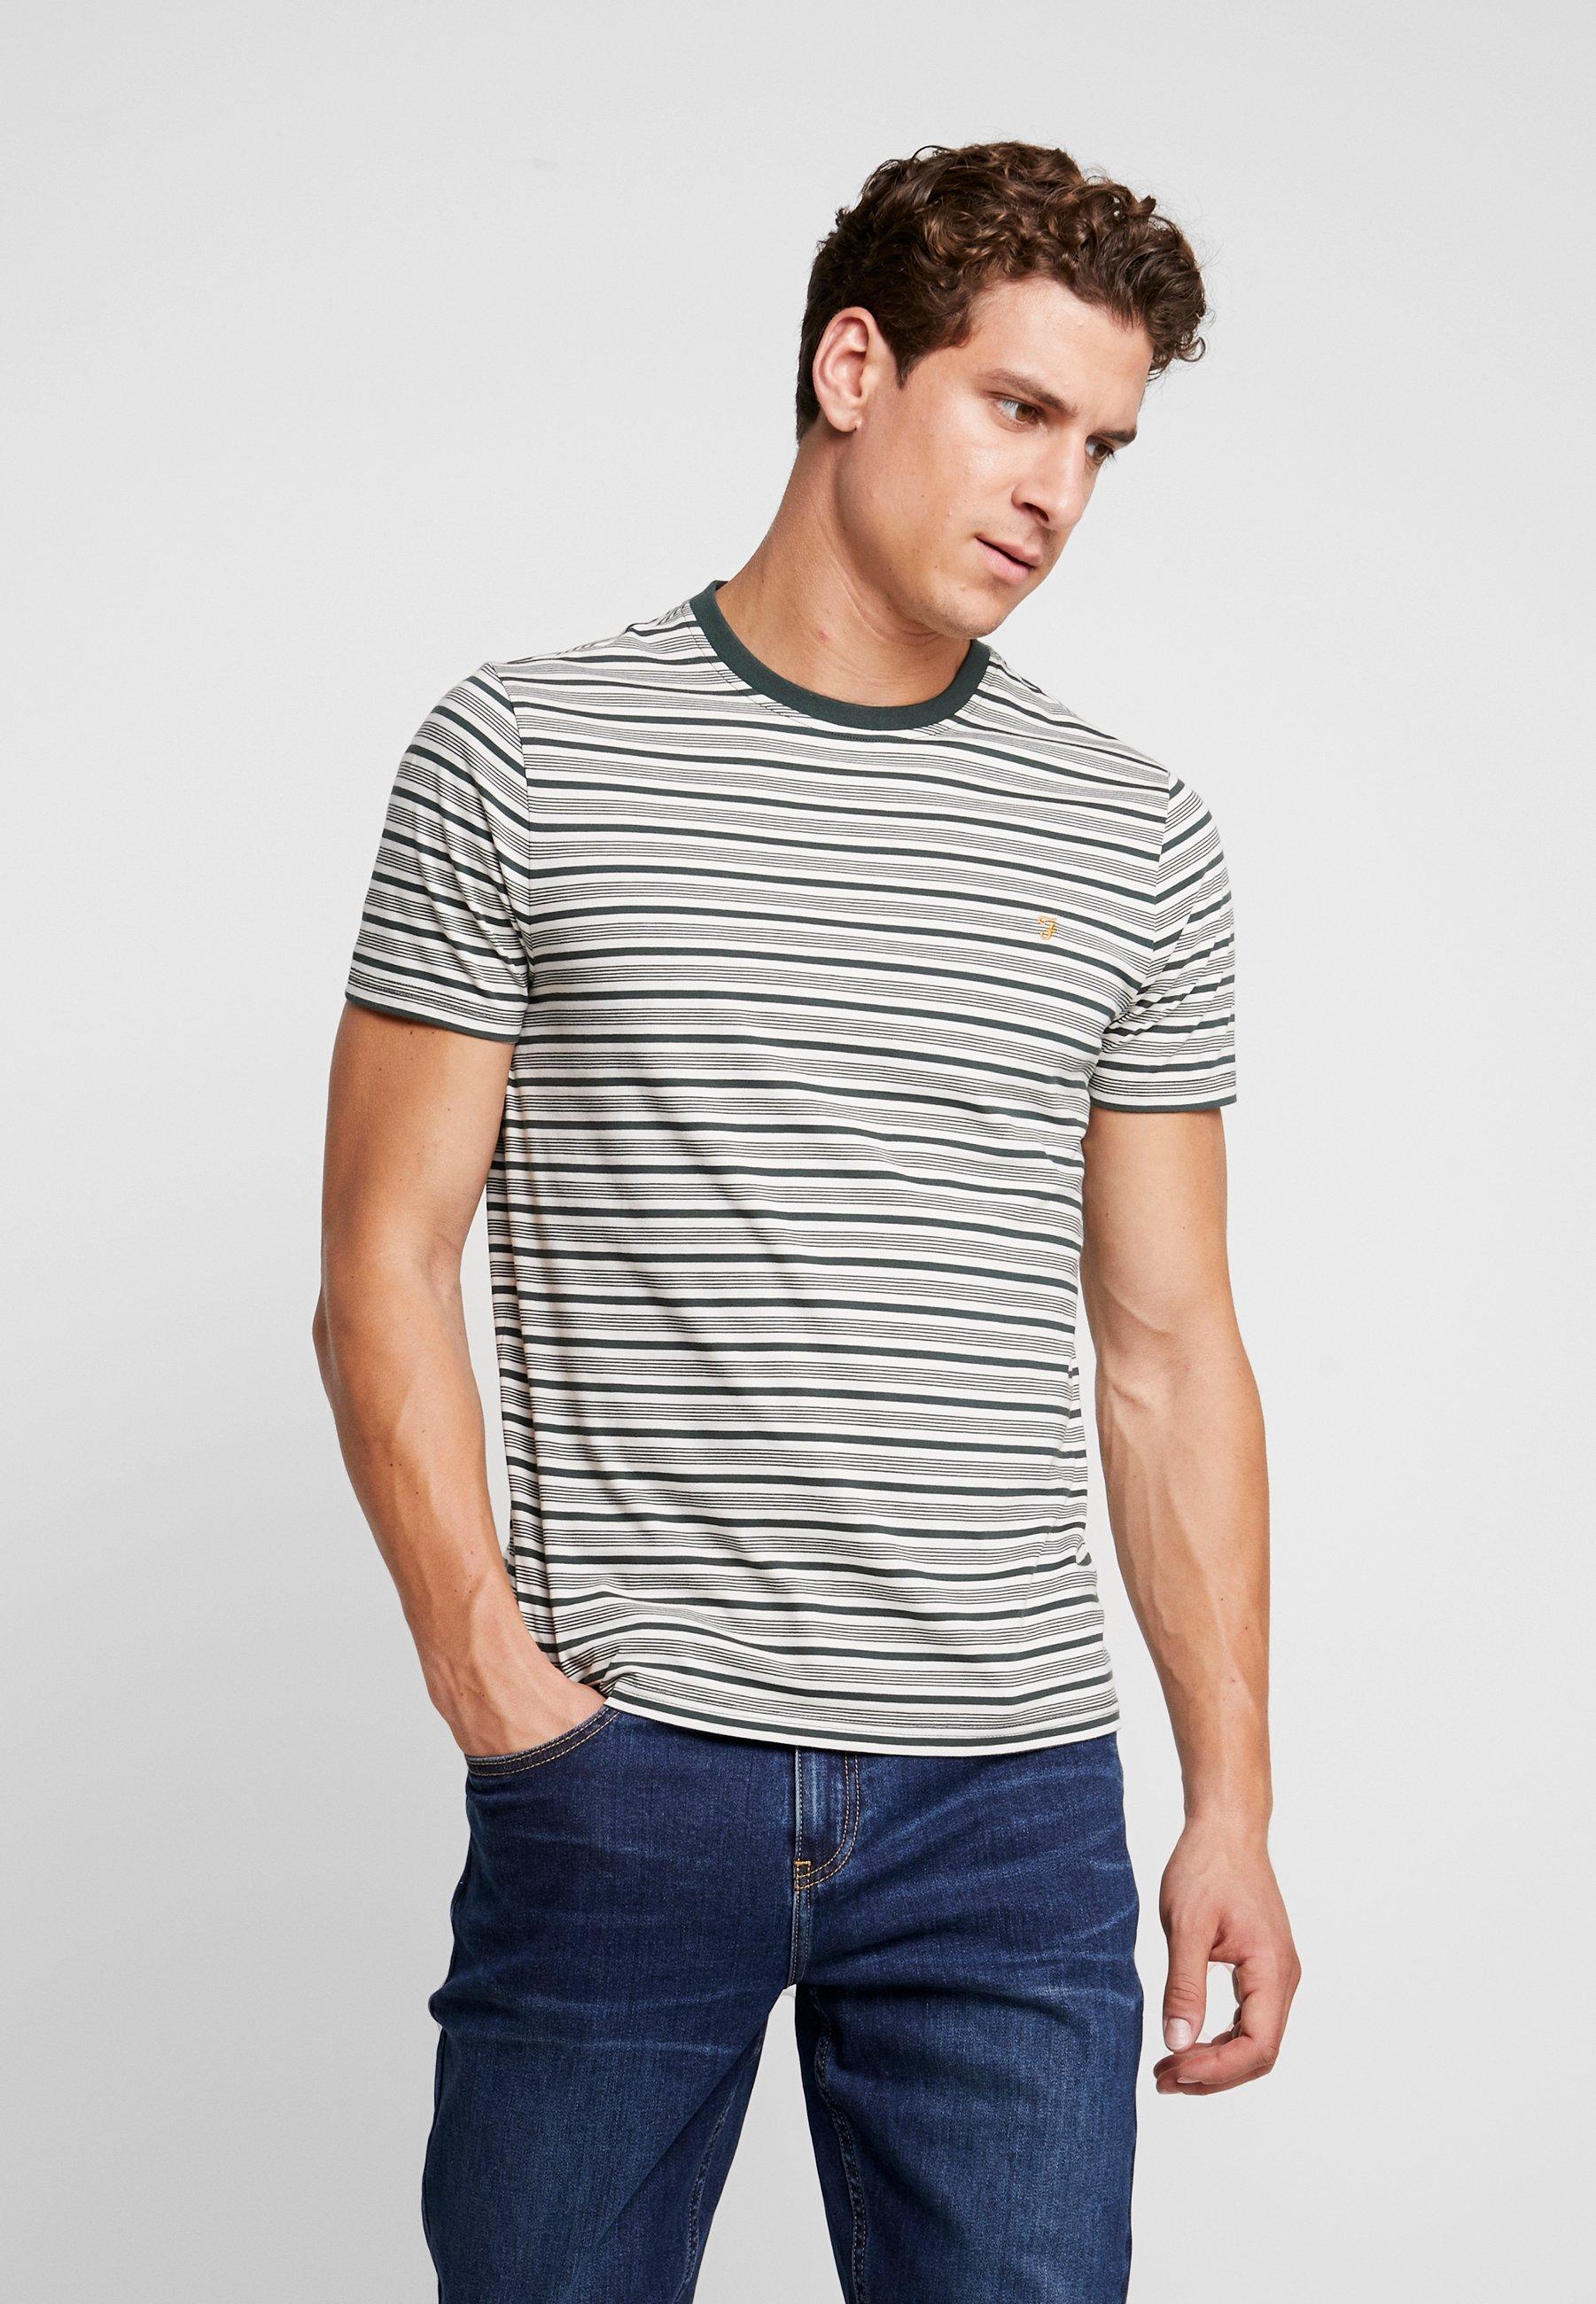 TeeT shirt Olive Deep Farah Stripe Reeth Imprimé xtChrsQd